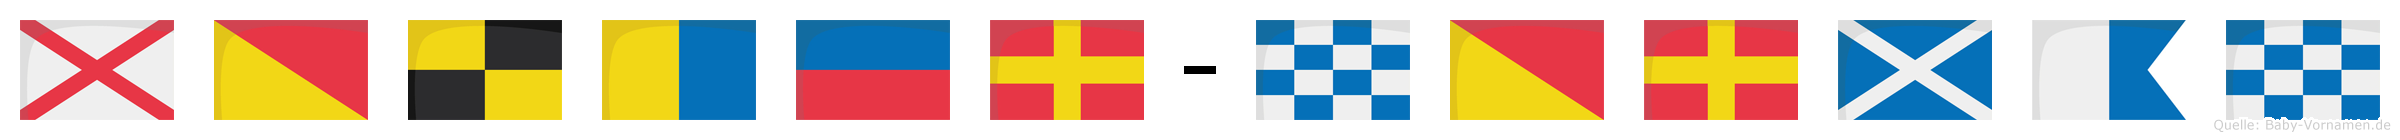 Volker-Norman im Flaggenalphabet